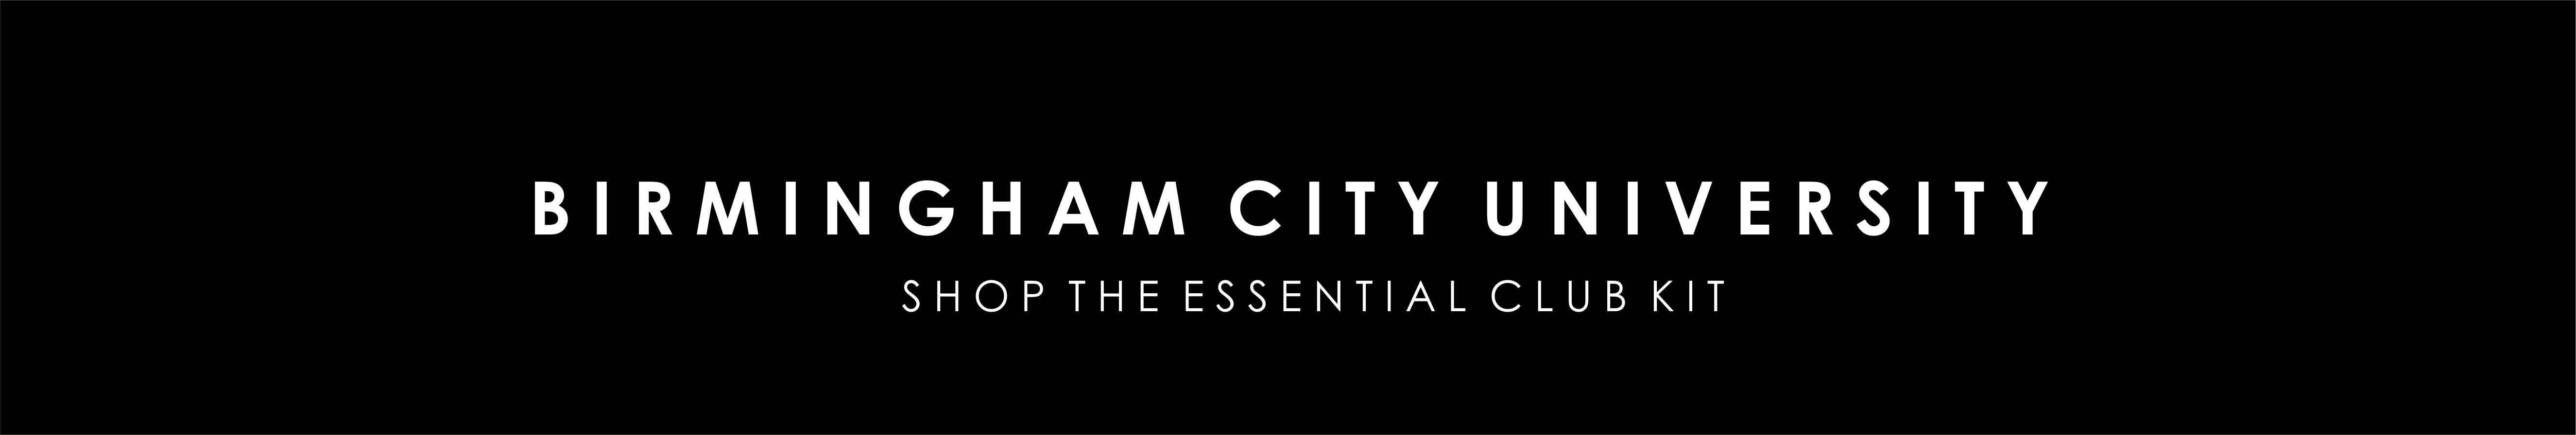 birmingham-city-university-banner-bcu-sport.jpg